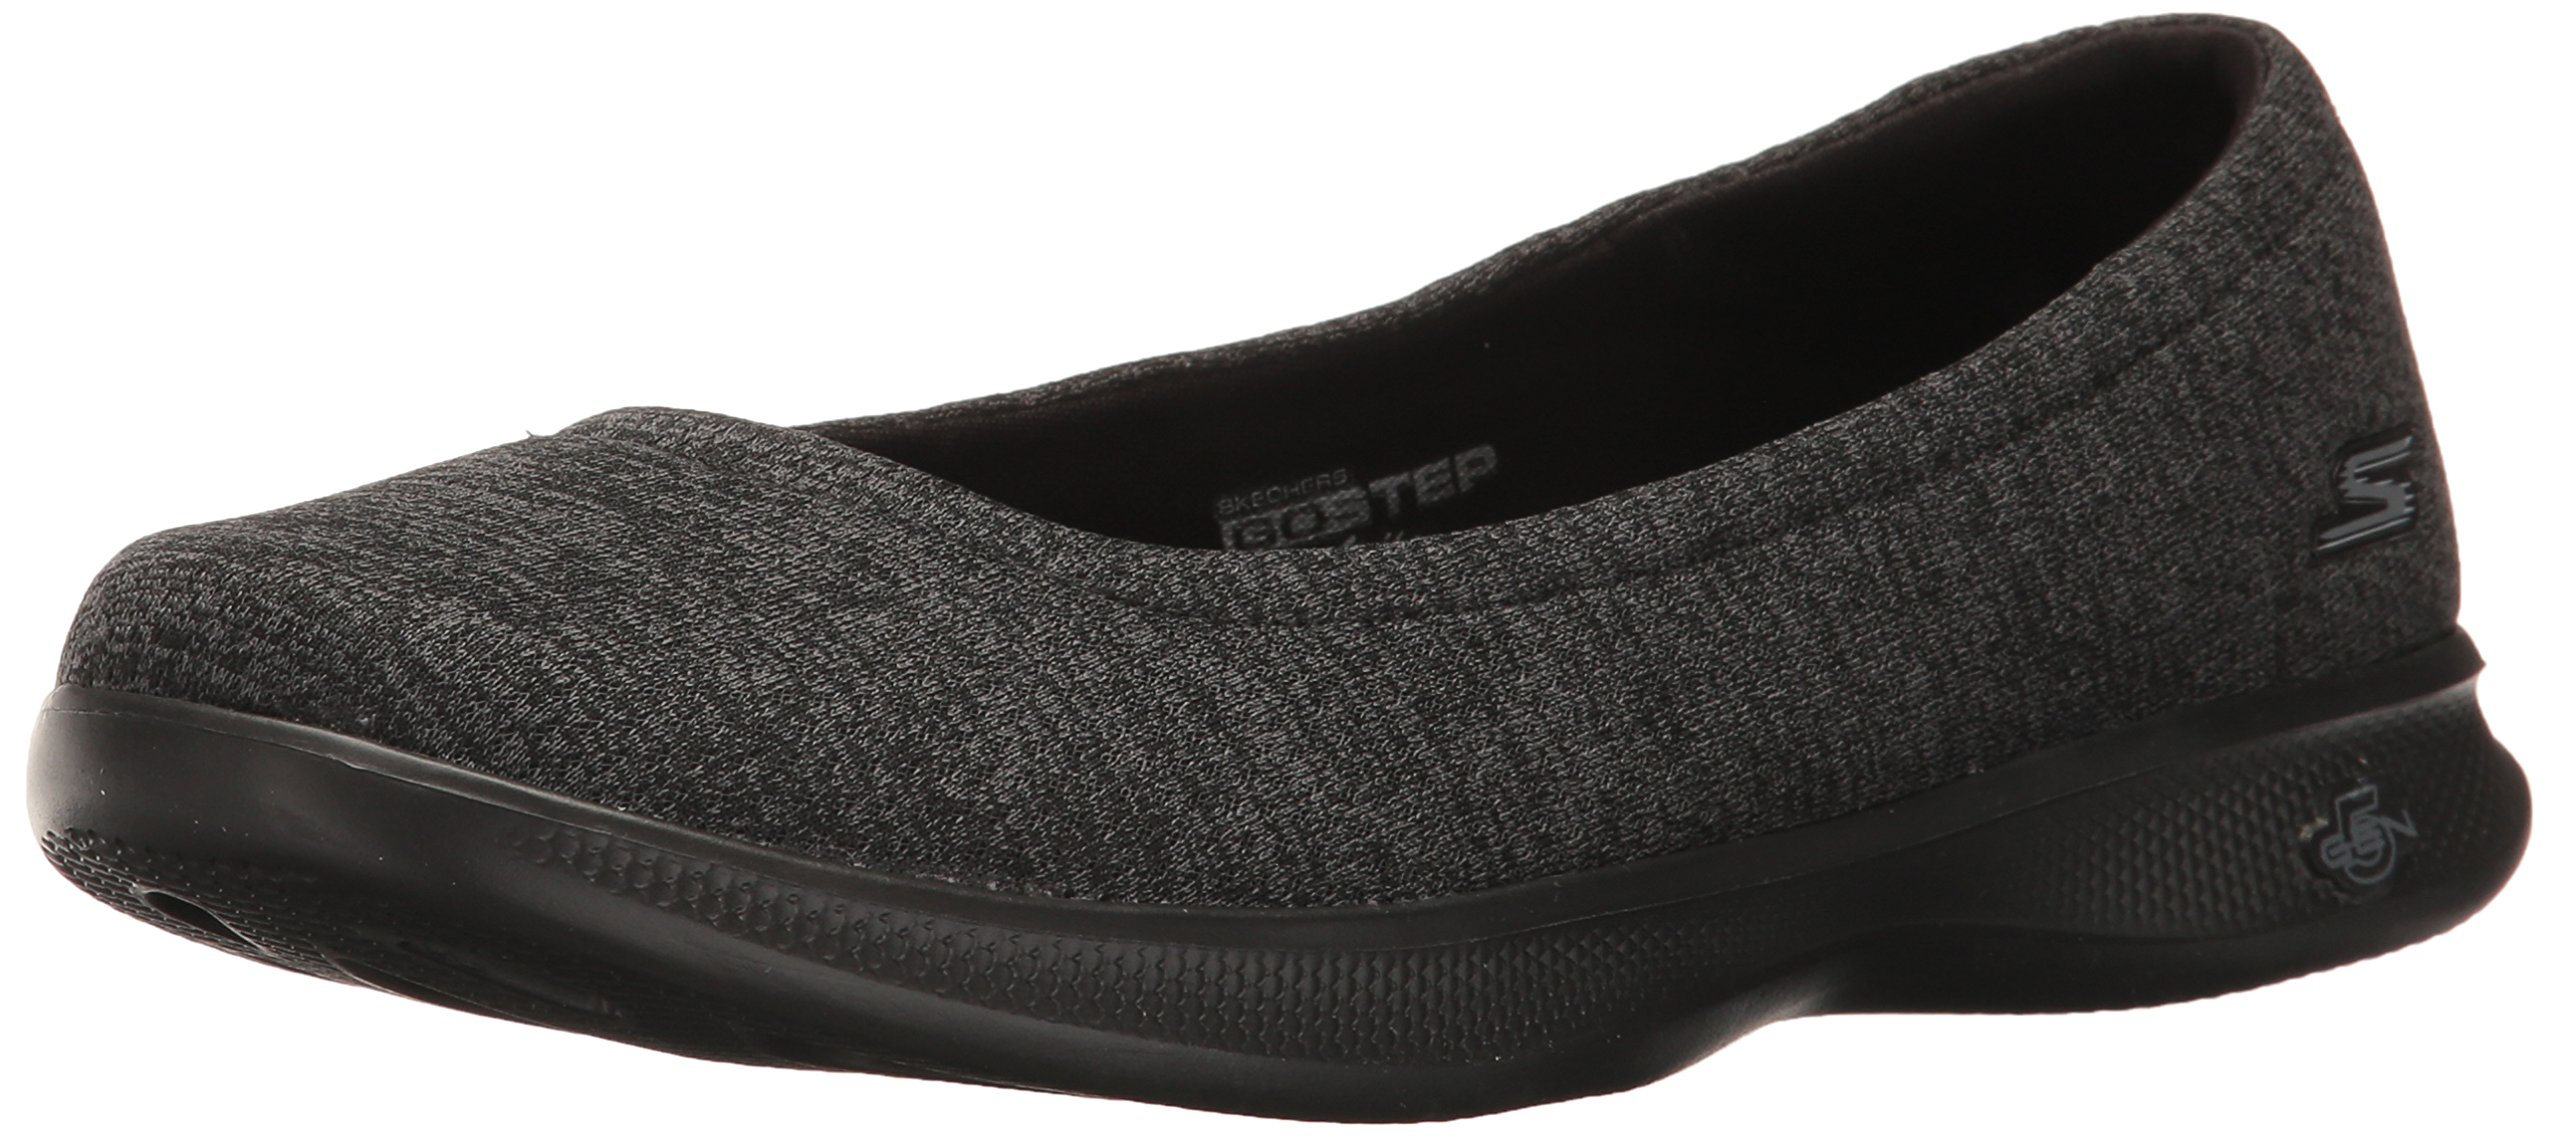 Skechers Performance Women's Go Step Lite-Evoke Walking Shoe,Black/Gray,10 M US